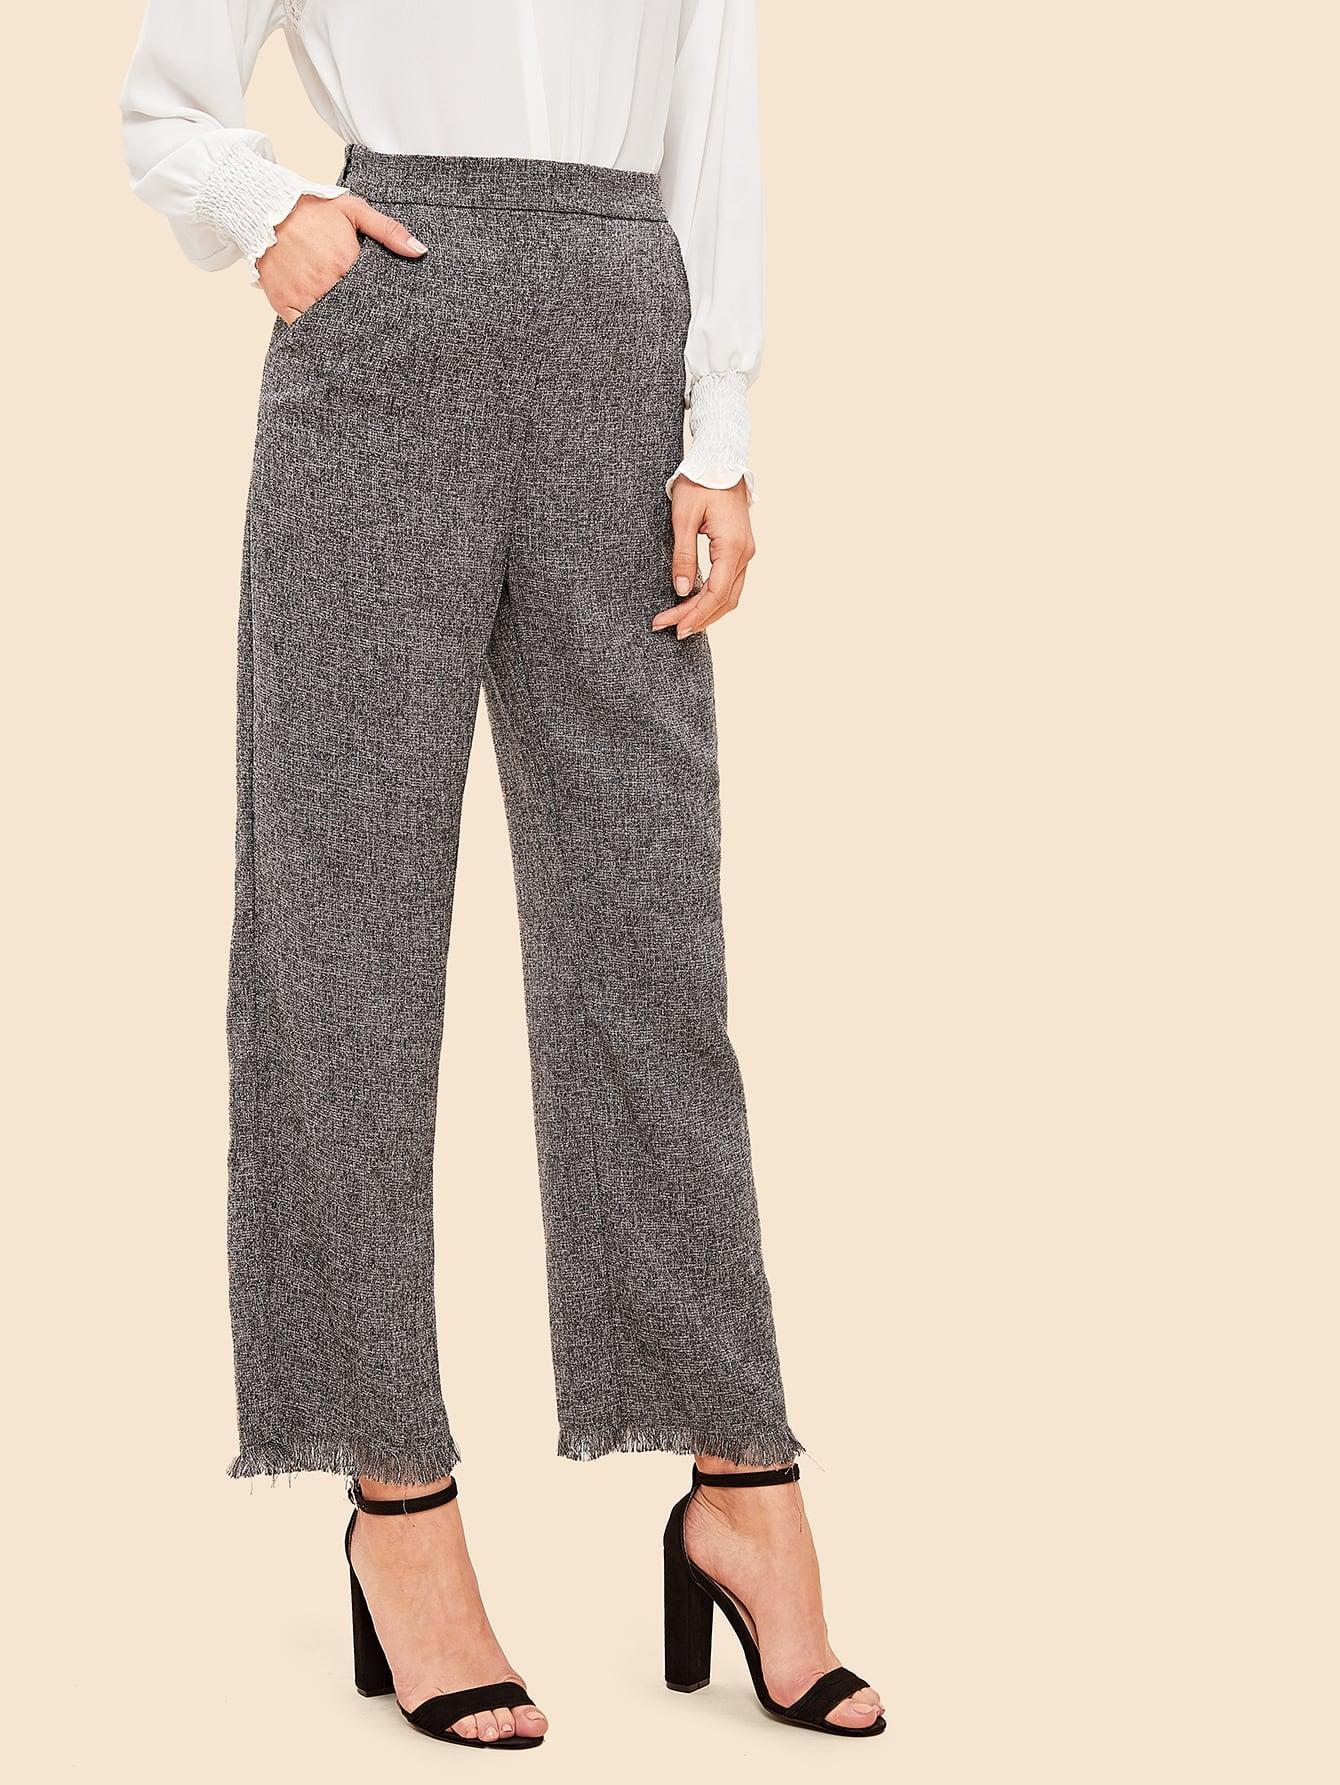 70s  широкие твидовые брюки со складкой thumbnail